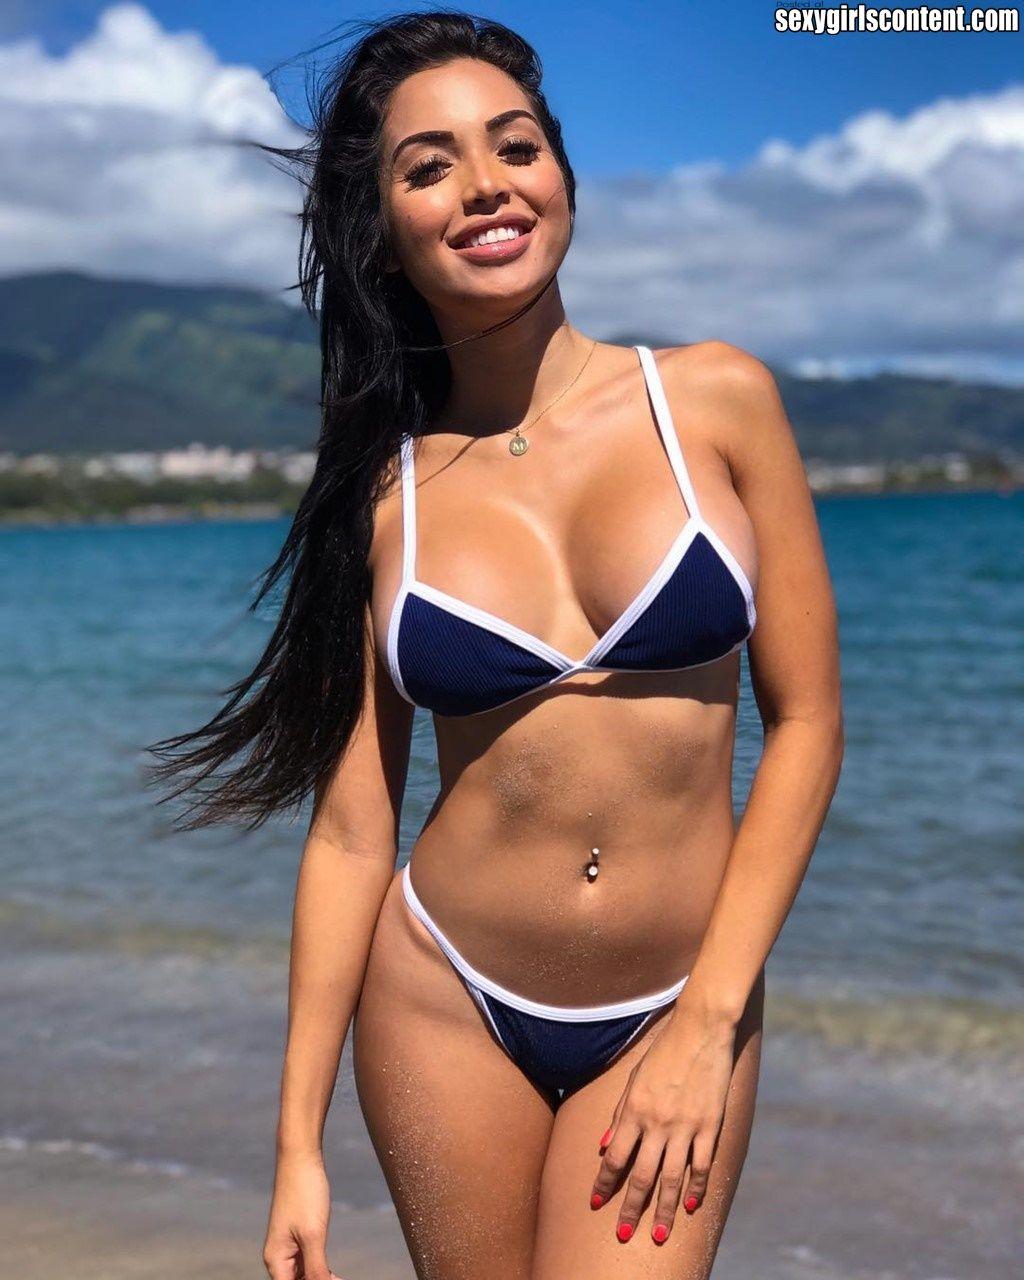 Bikini Maddy Belle nudes (46 photos), Twitter